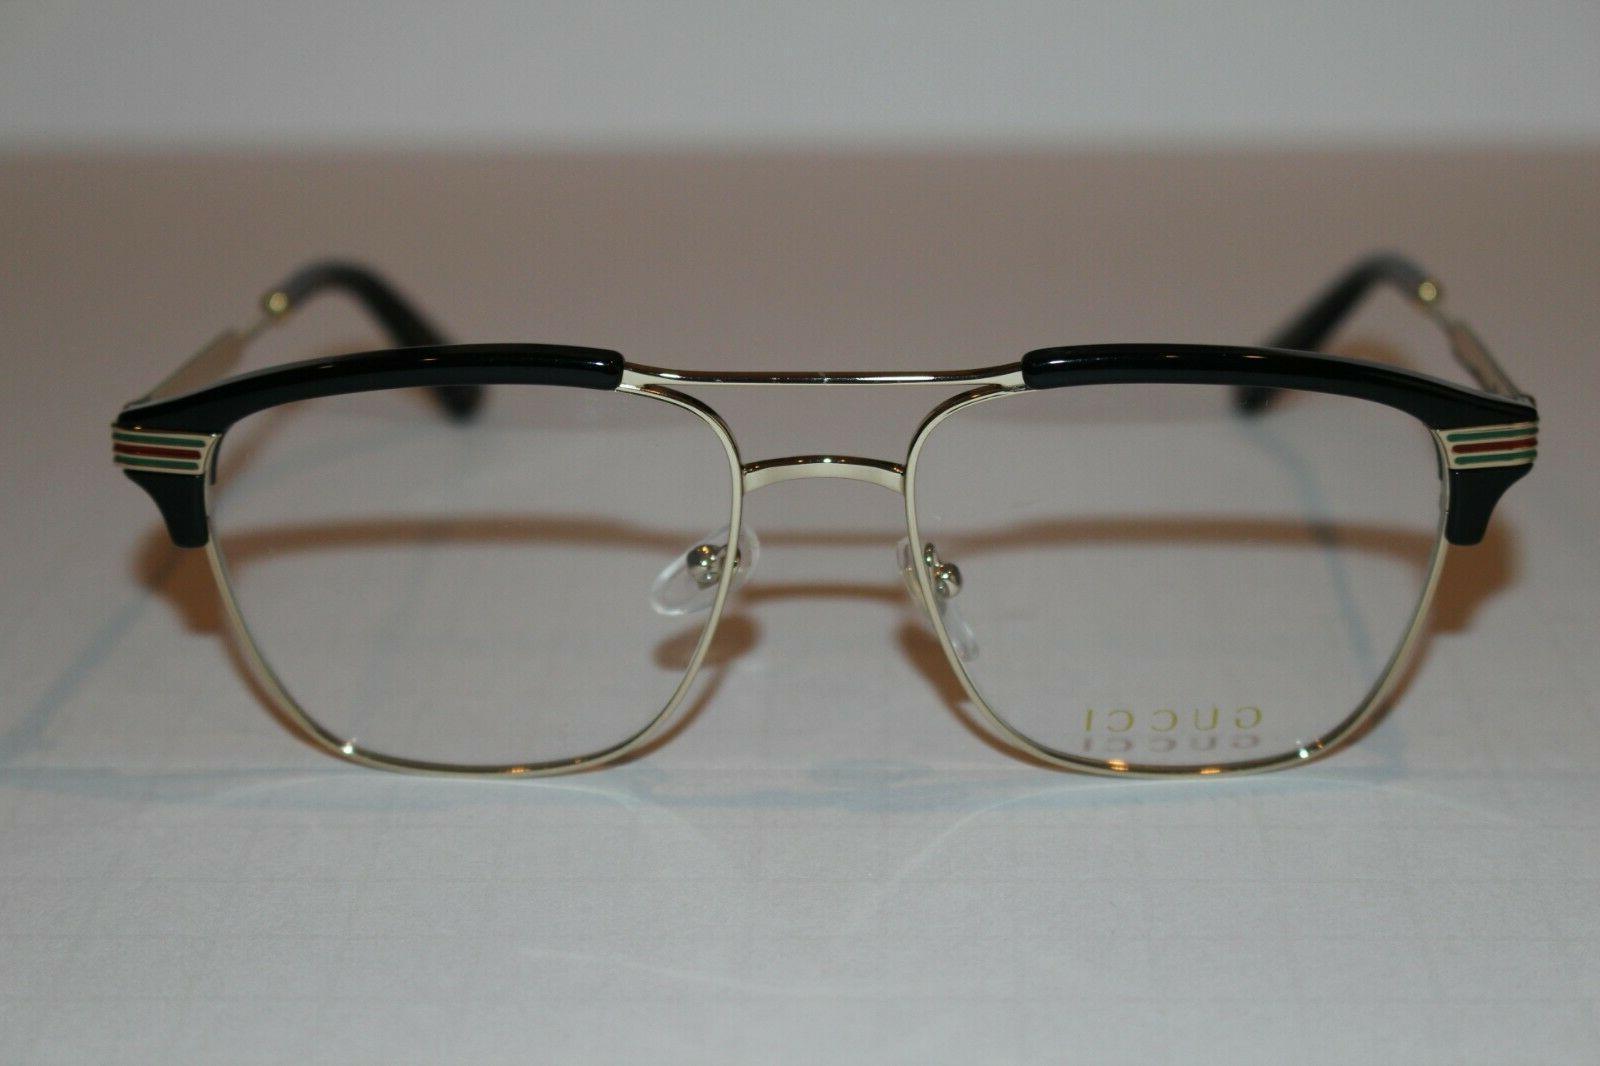 gg0241o 002 eyeglass frames black metal 54